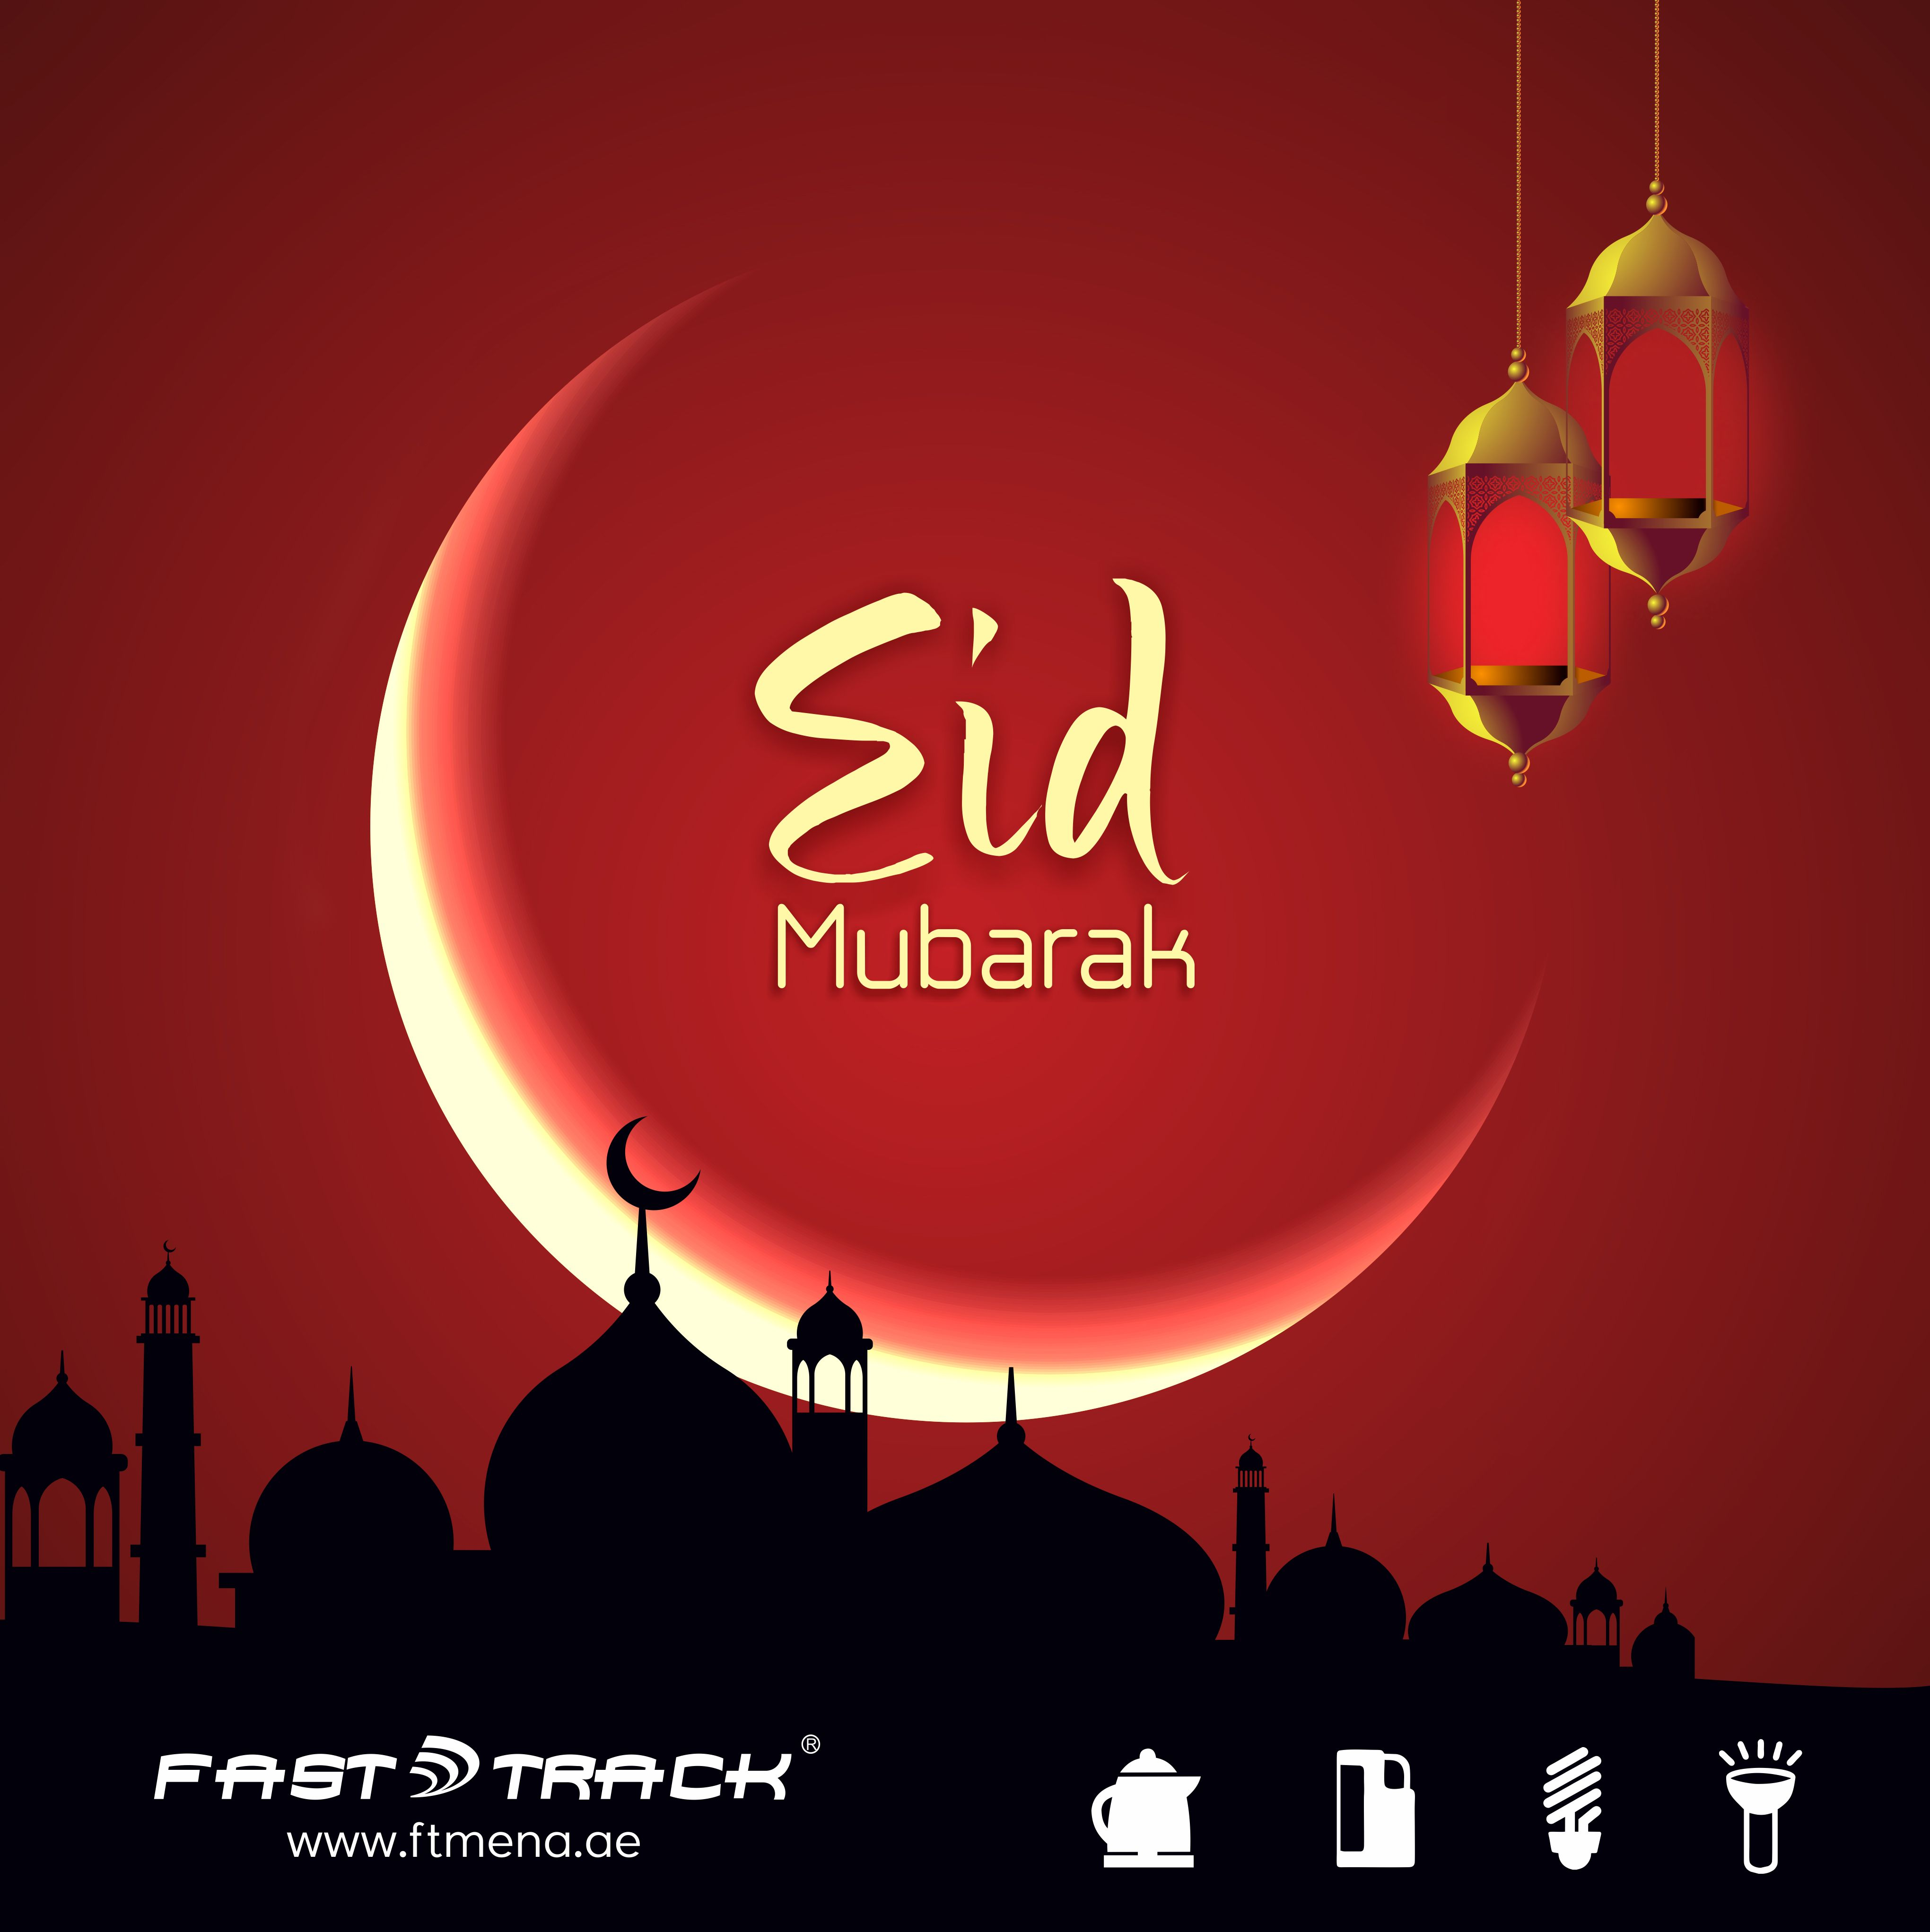 Happy Eid Mubarak Eid Ul Fitr Wishes By Fast Track Dubai Eidulfitr